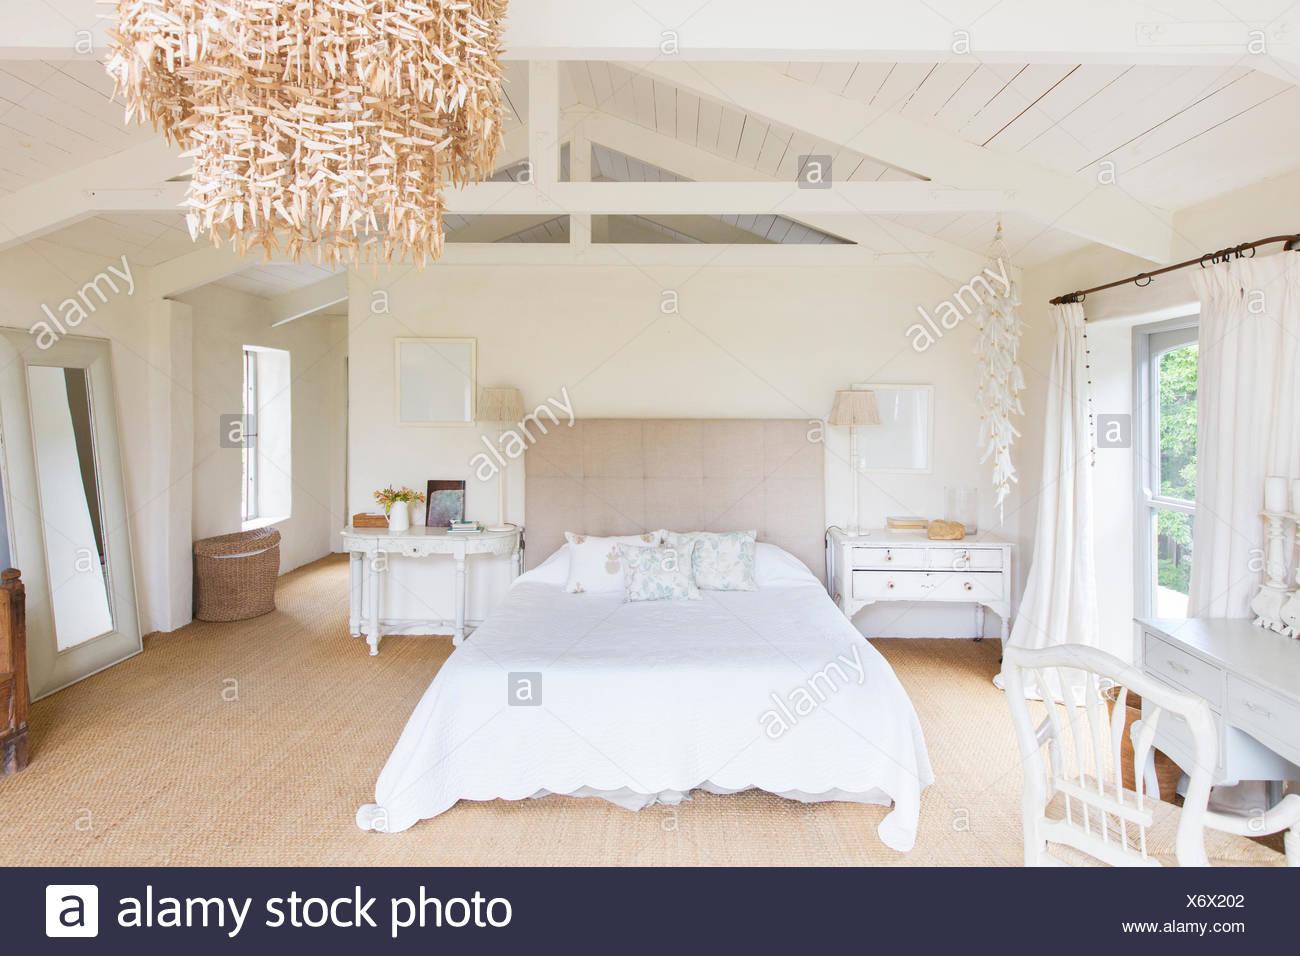 Chandelier and bed in rustic bedroom - Stock Image